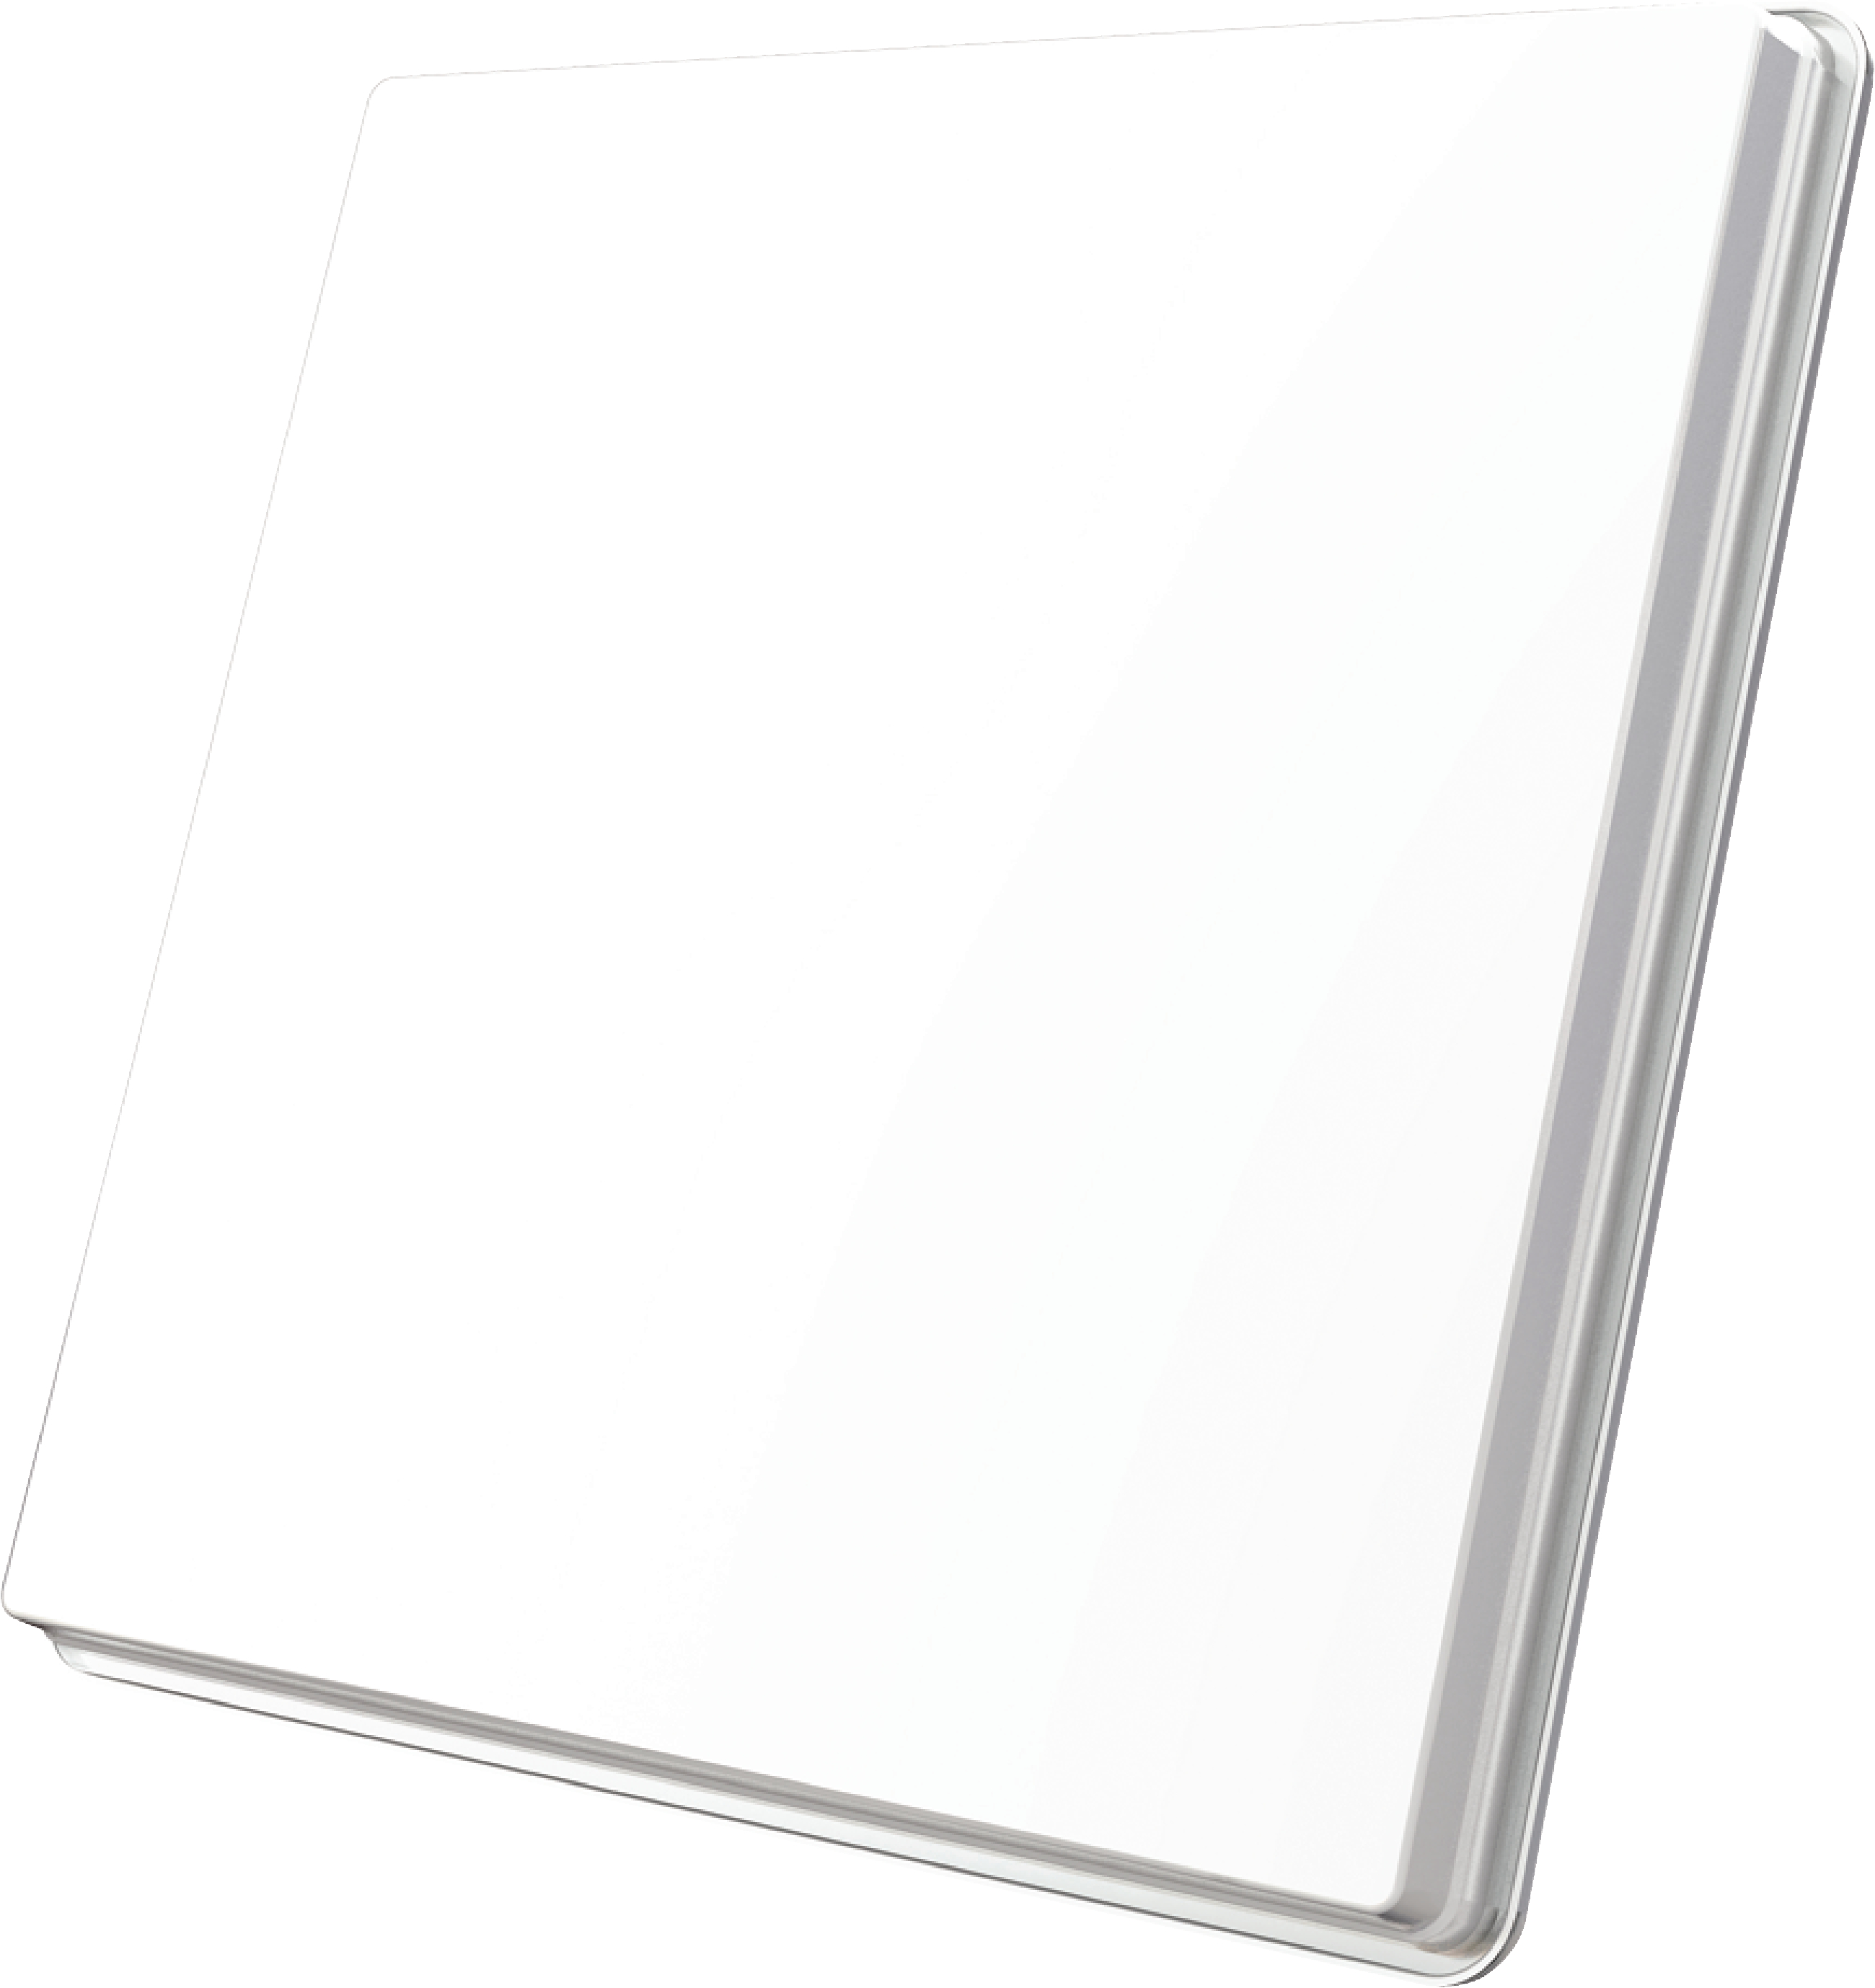 H50D4 FLAT SATELLITE DISH QUAD LNB WHITE